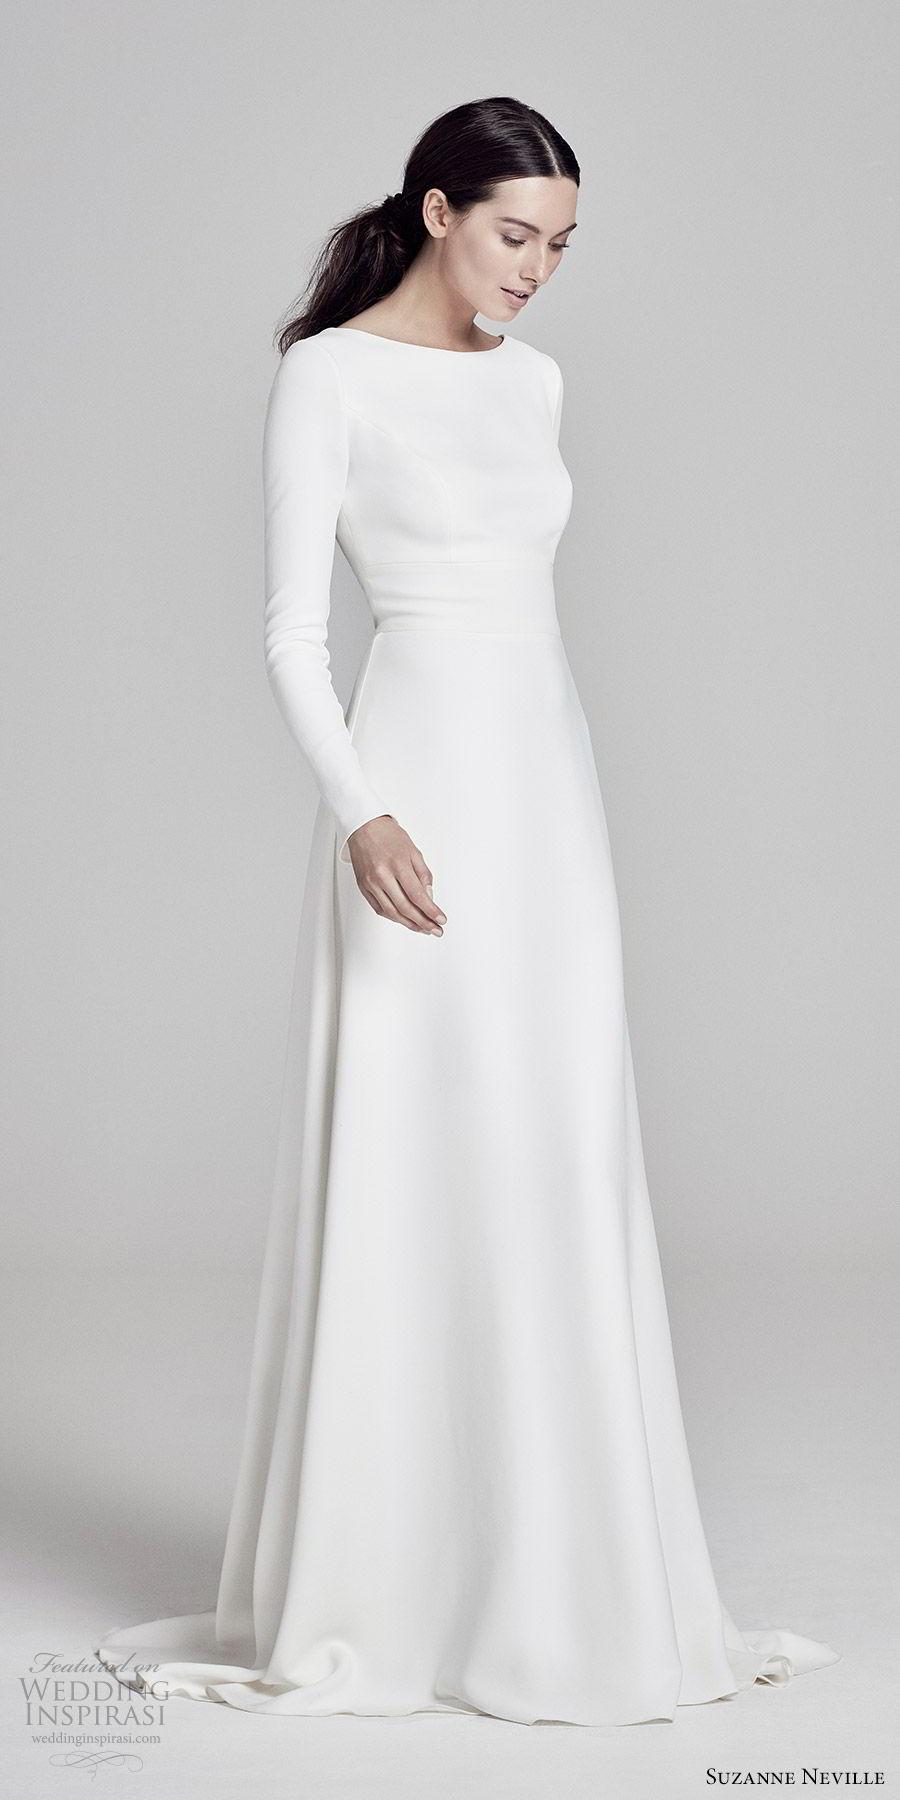 suzanne neville bridal 2019 long sleees jewel neck minimal a line wedding dress (adair) chic modern keyhole back sweep train mv